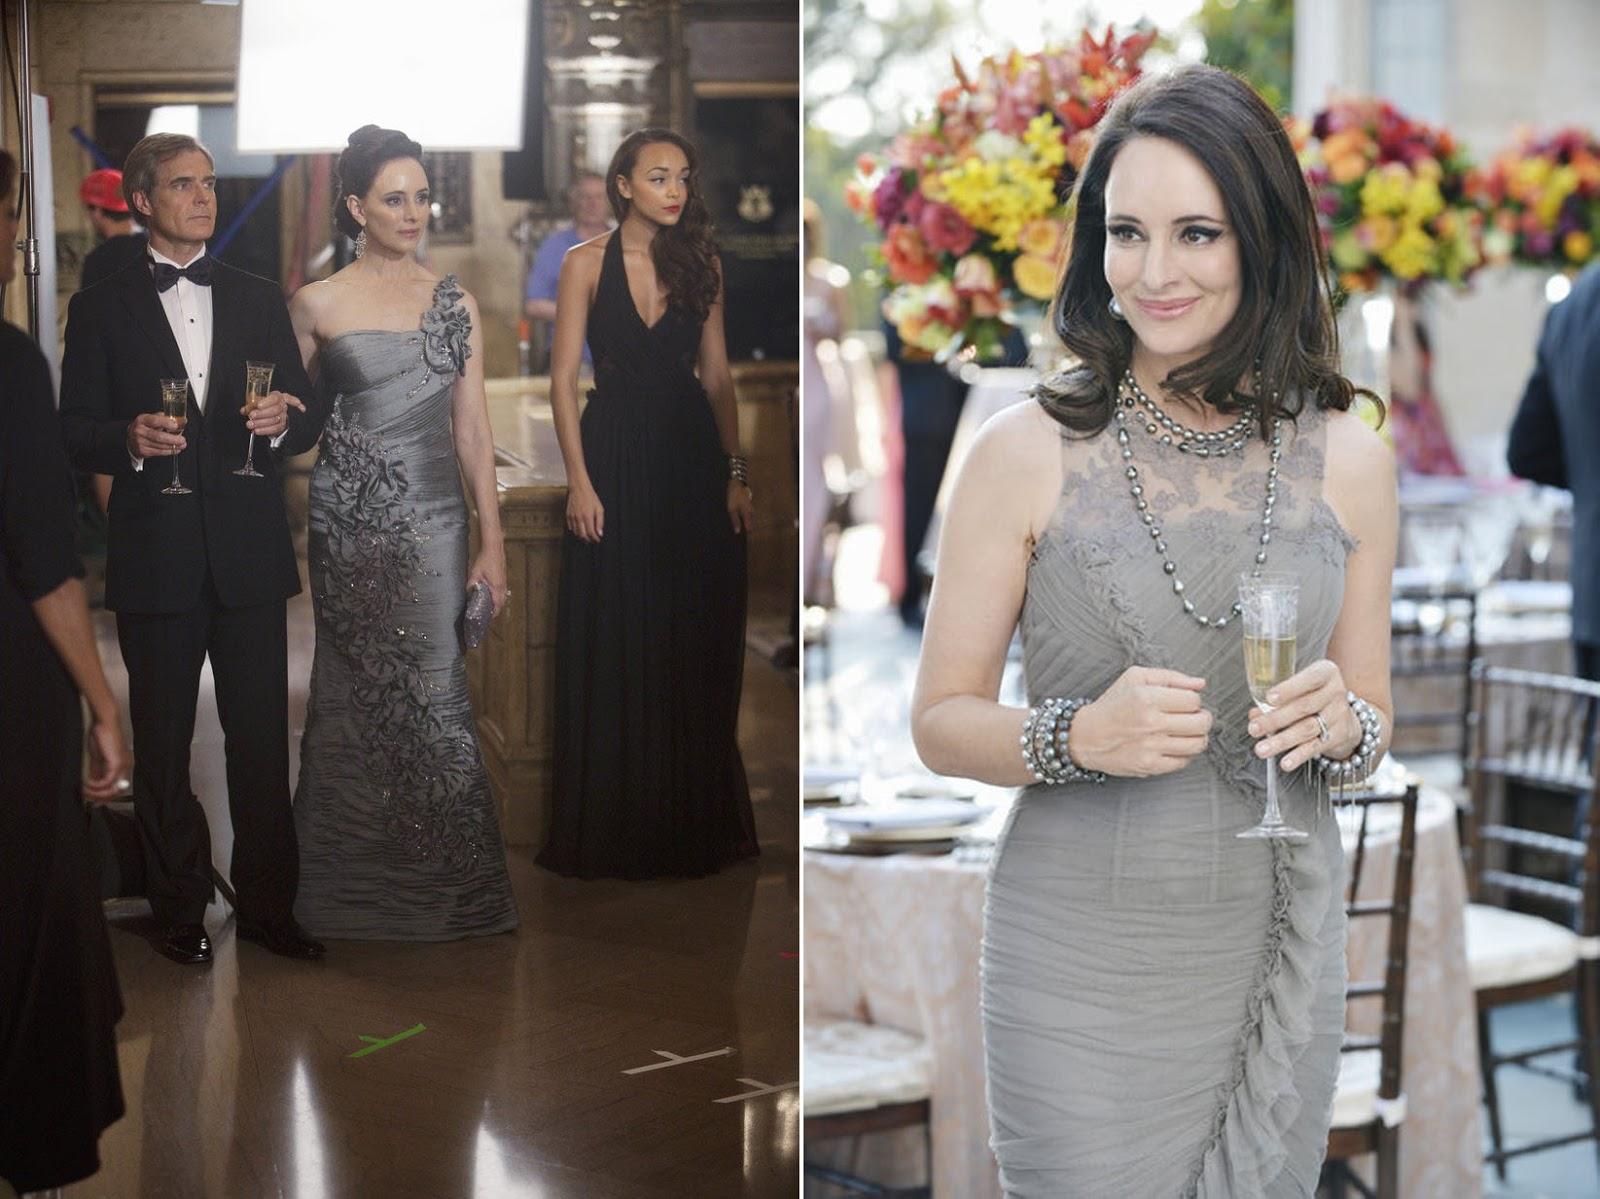 revenge stills, fashionable tv series, victoria grayson, style inspiration